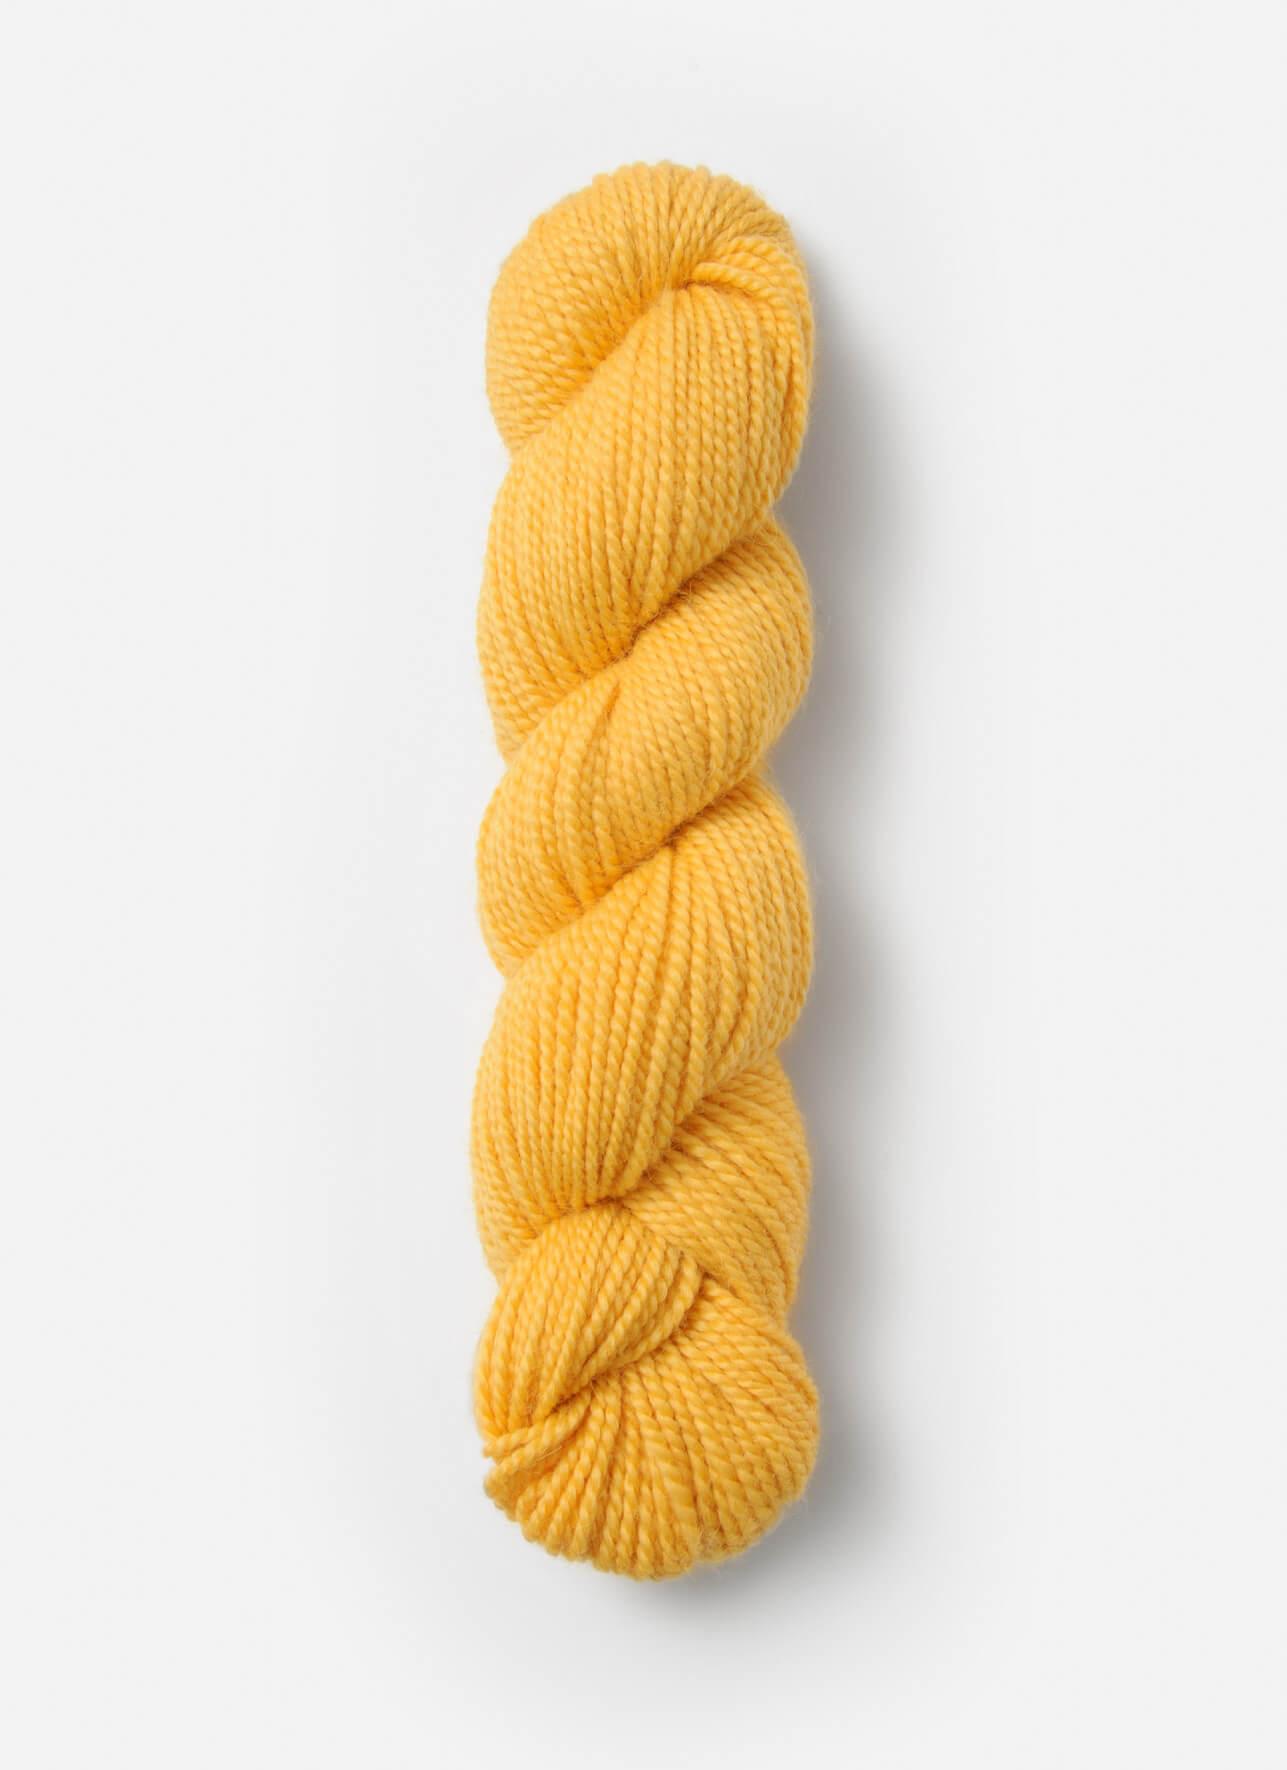 No. 537: Buttercup